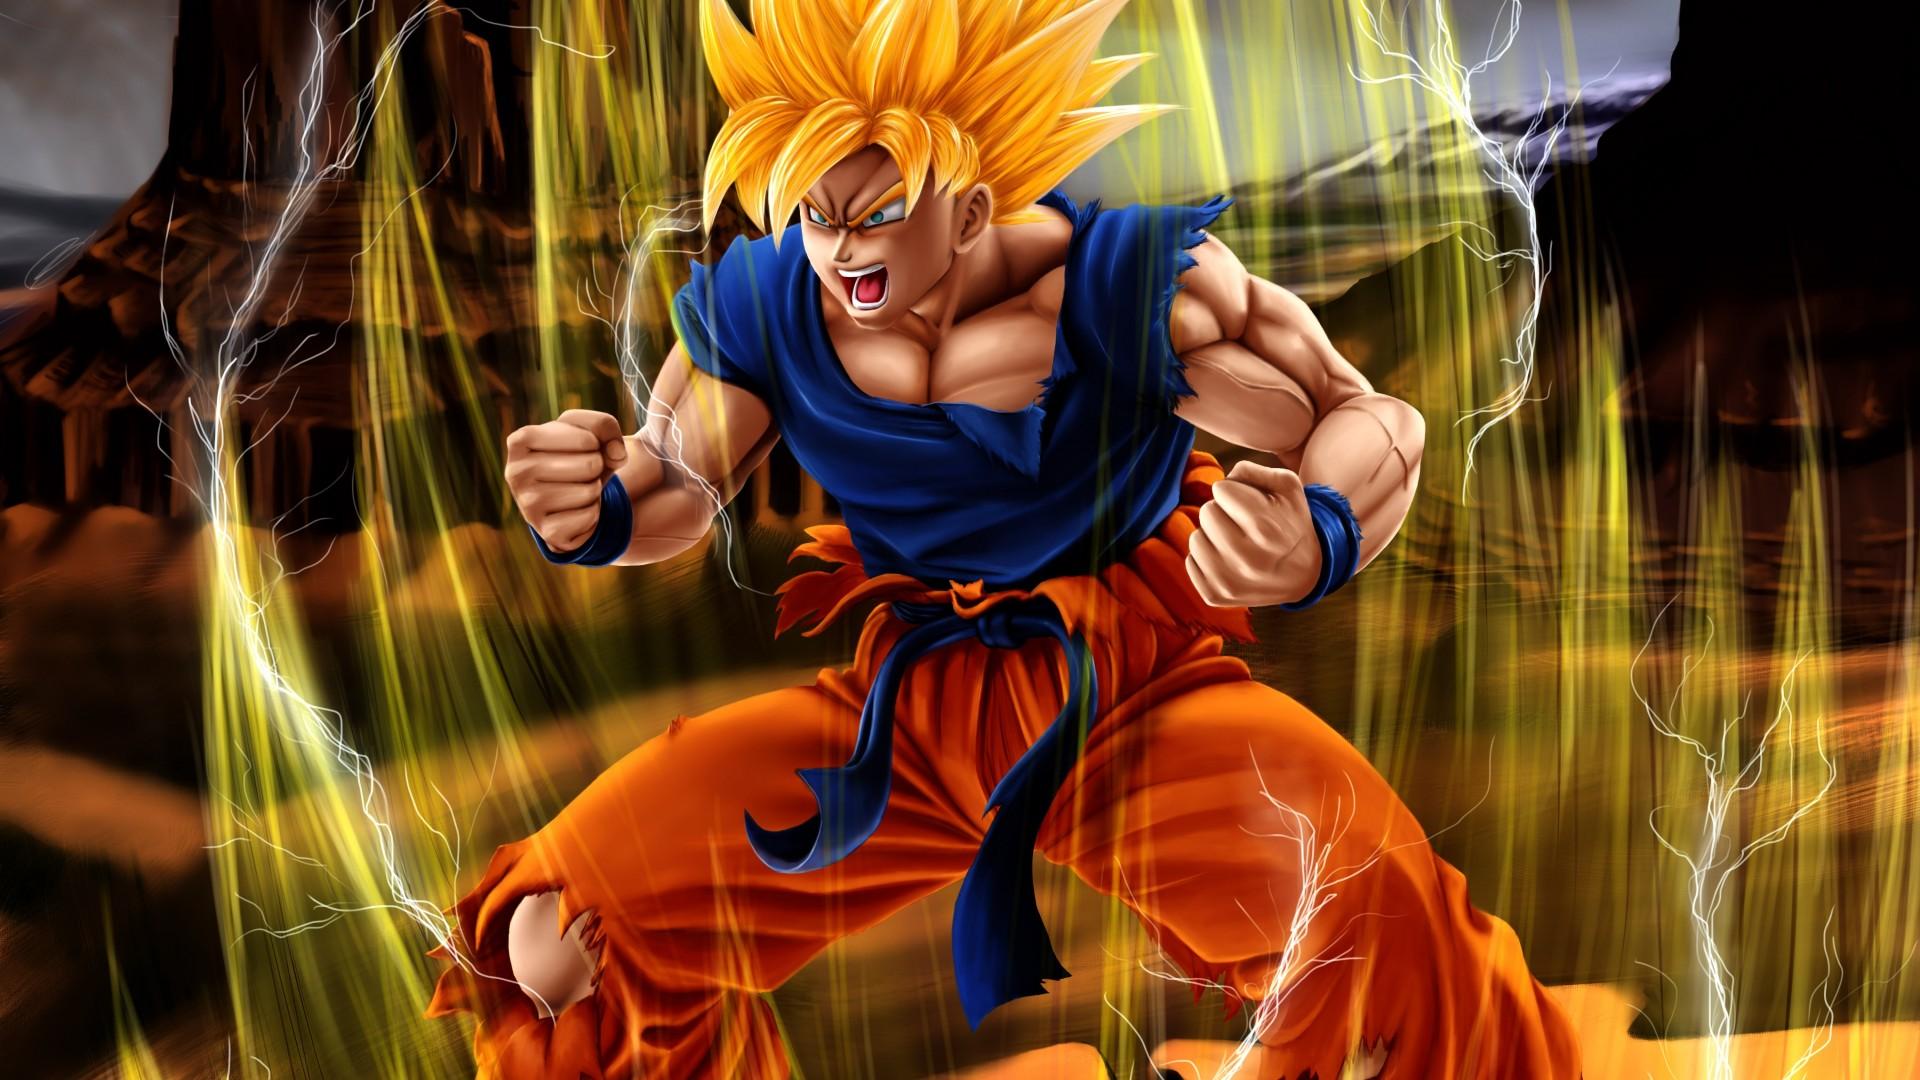 Dragon Ball Z Goku Wallpaper Backgrounds Best vicvaporcom 1920x1080